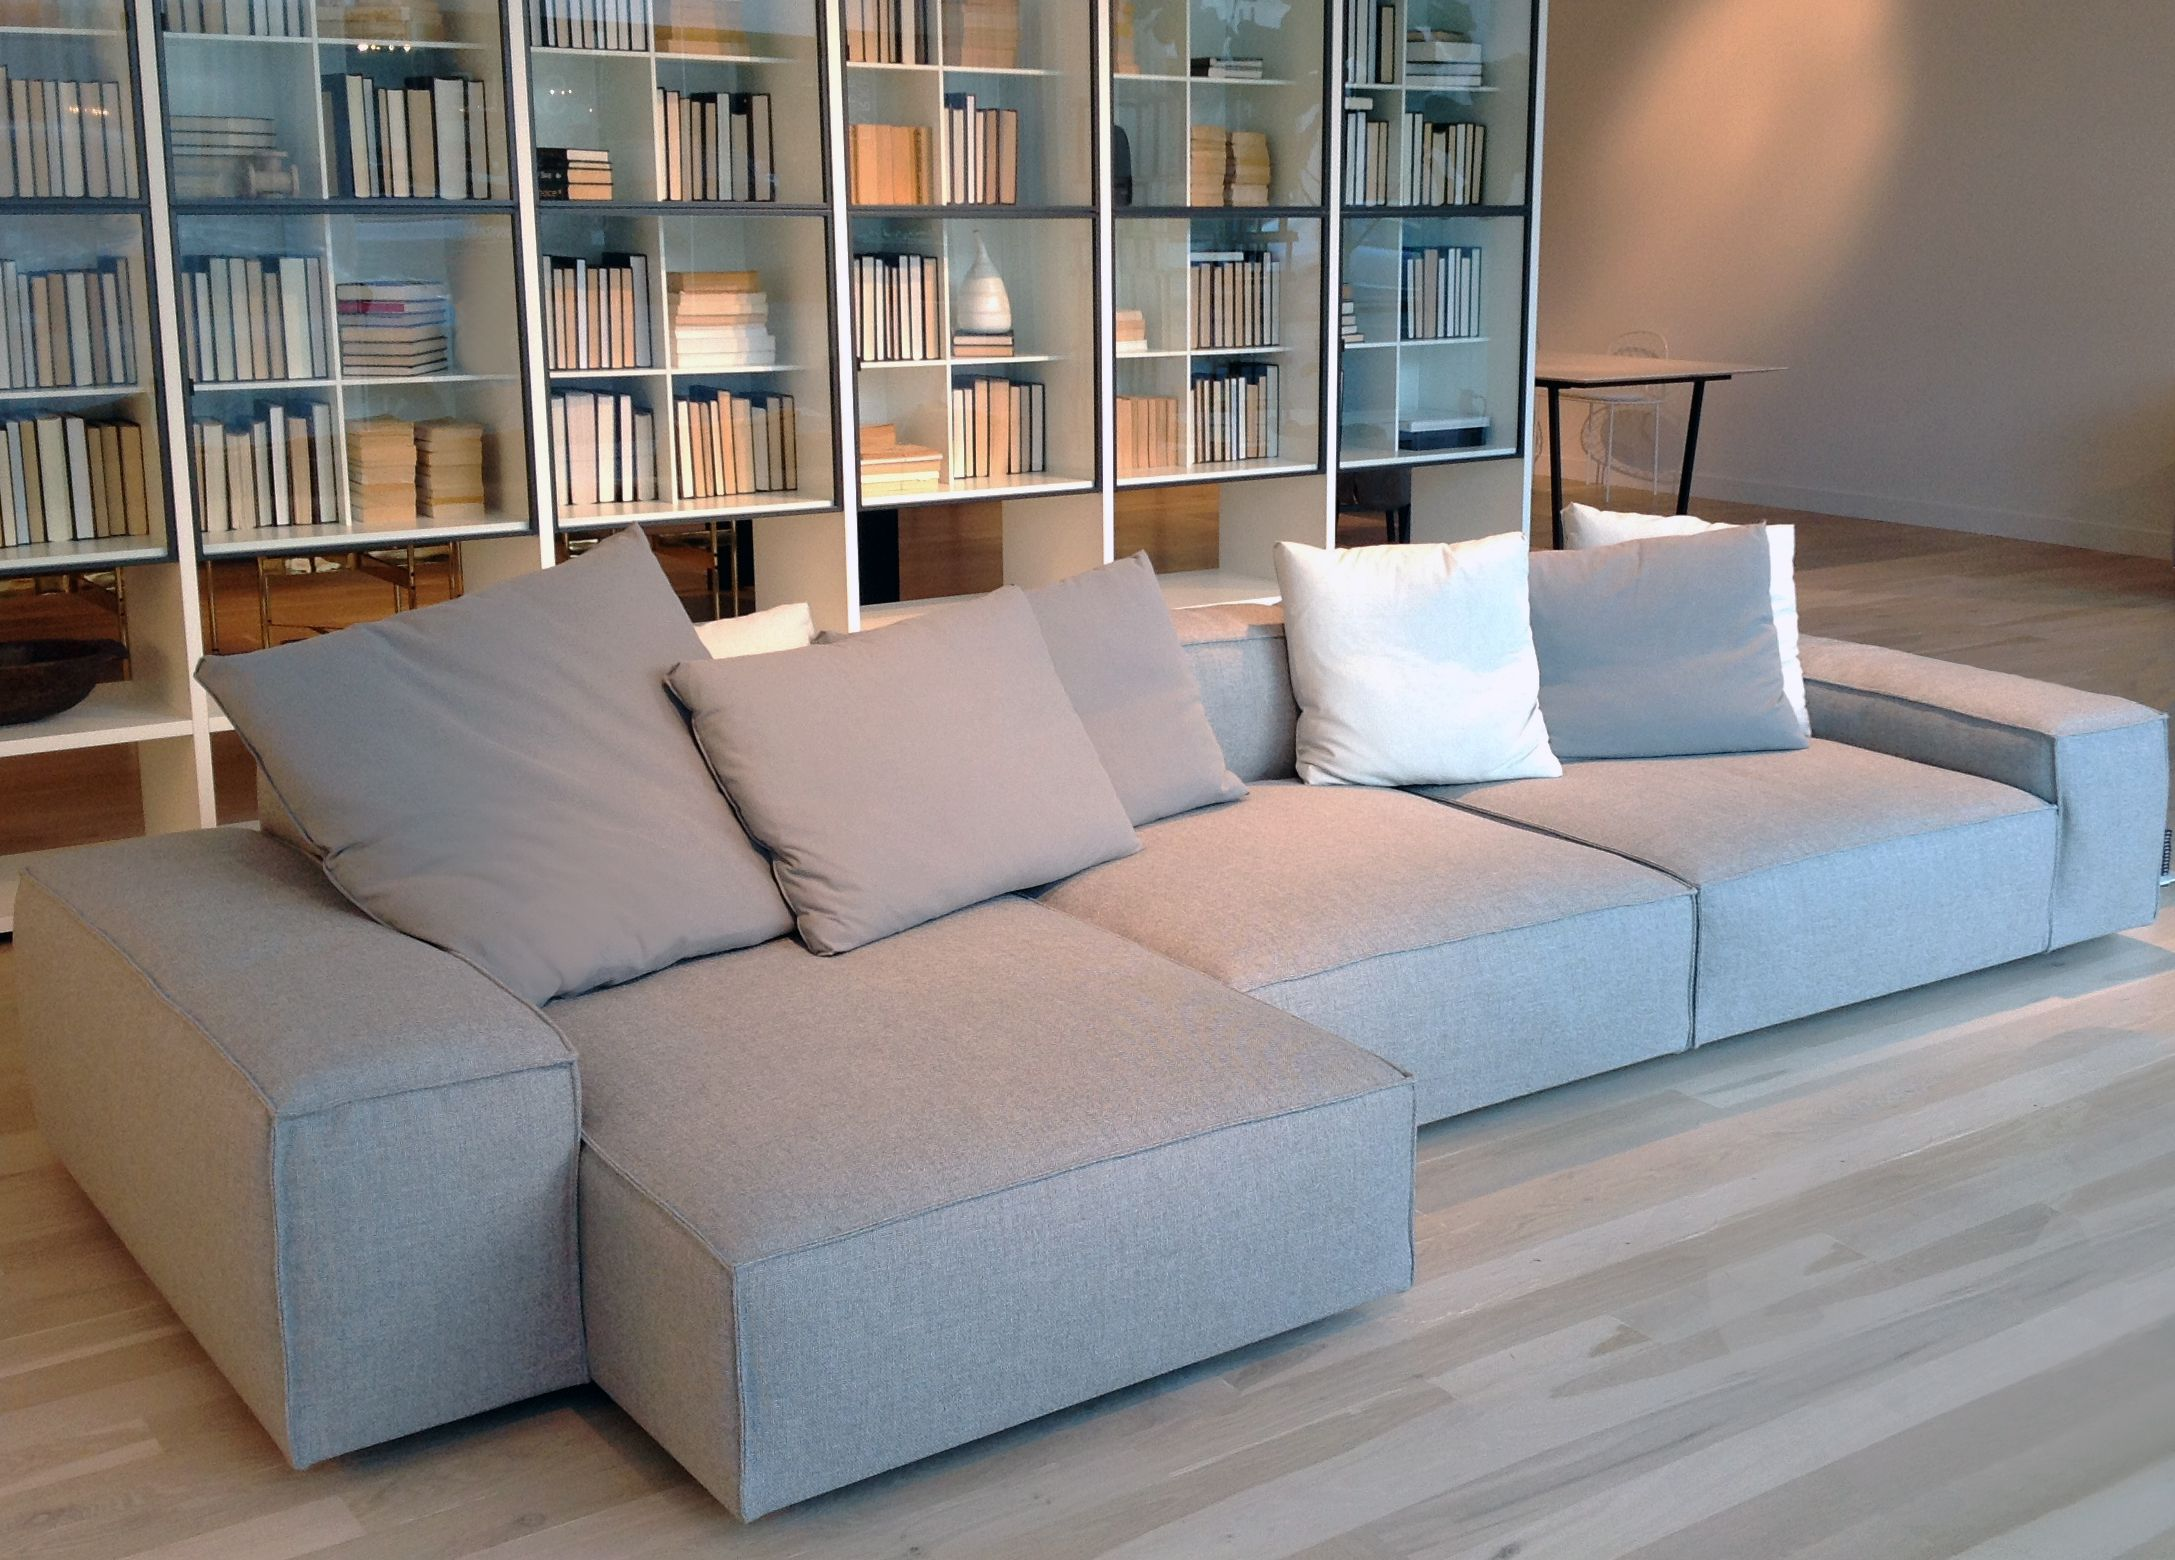 Sofas Design Of 60 S   Поиск в Google | Furnitureu0026interiors | Pinterest |  Spaces And Interiors